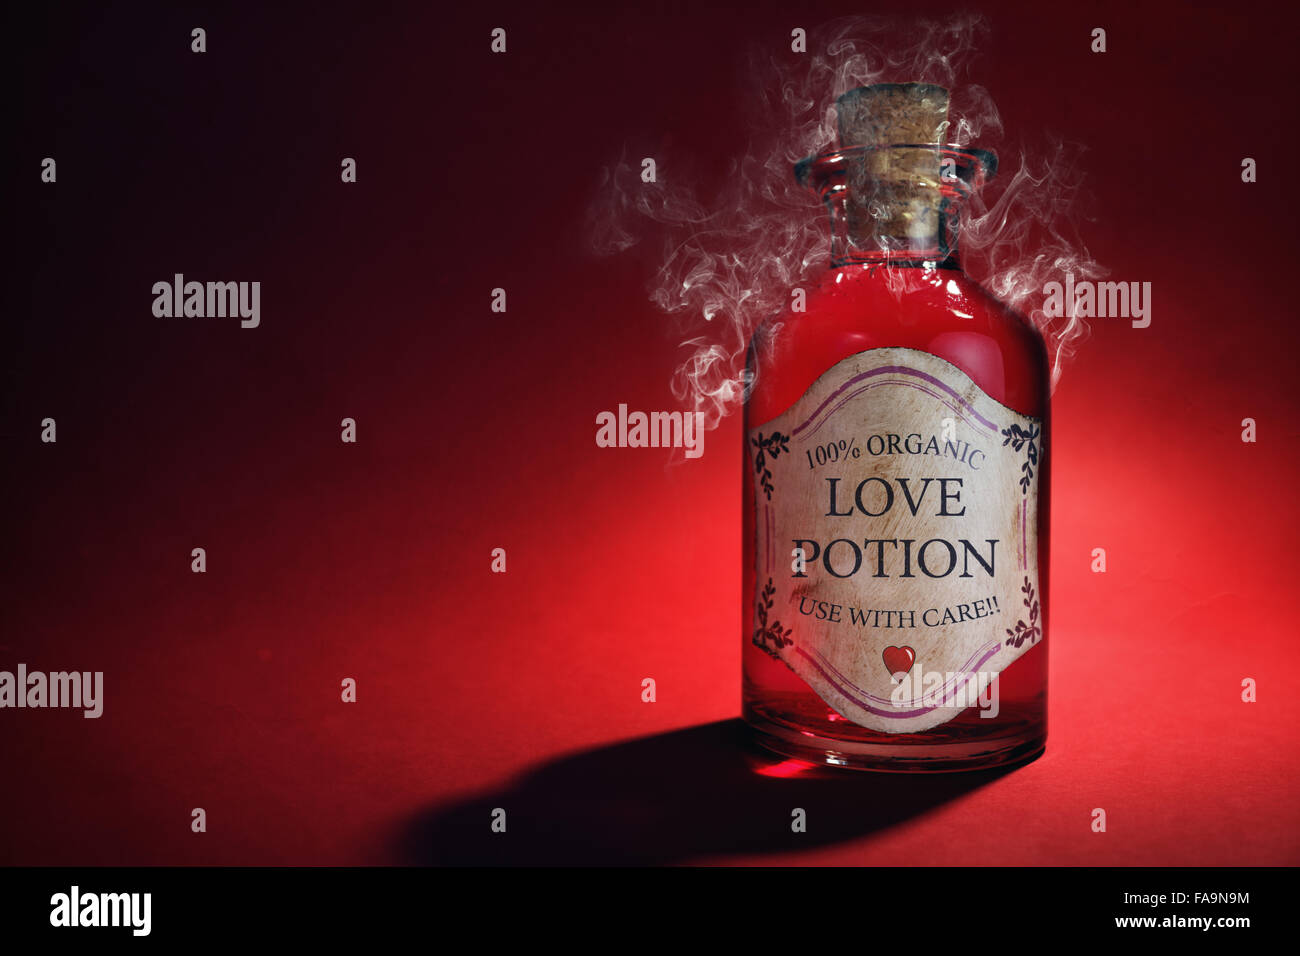 Love potion bottle - Stock Image